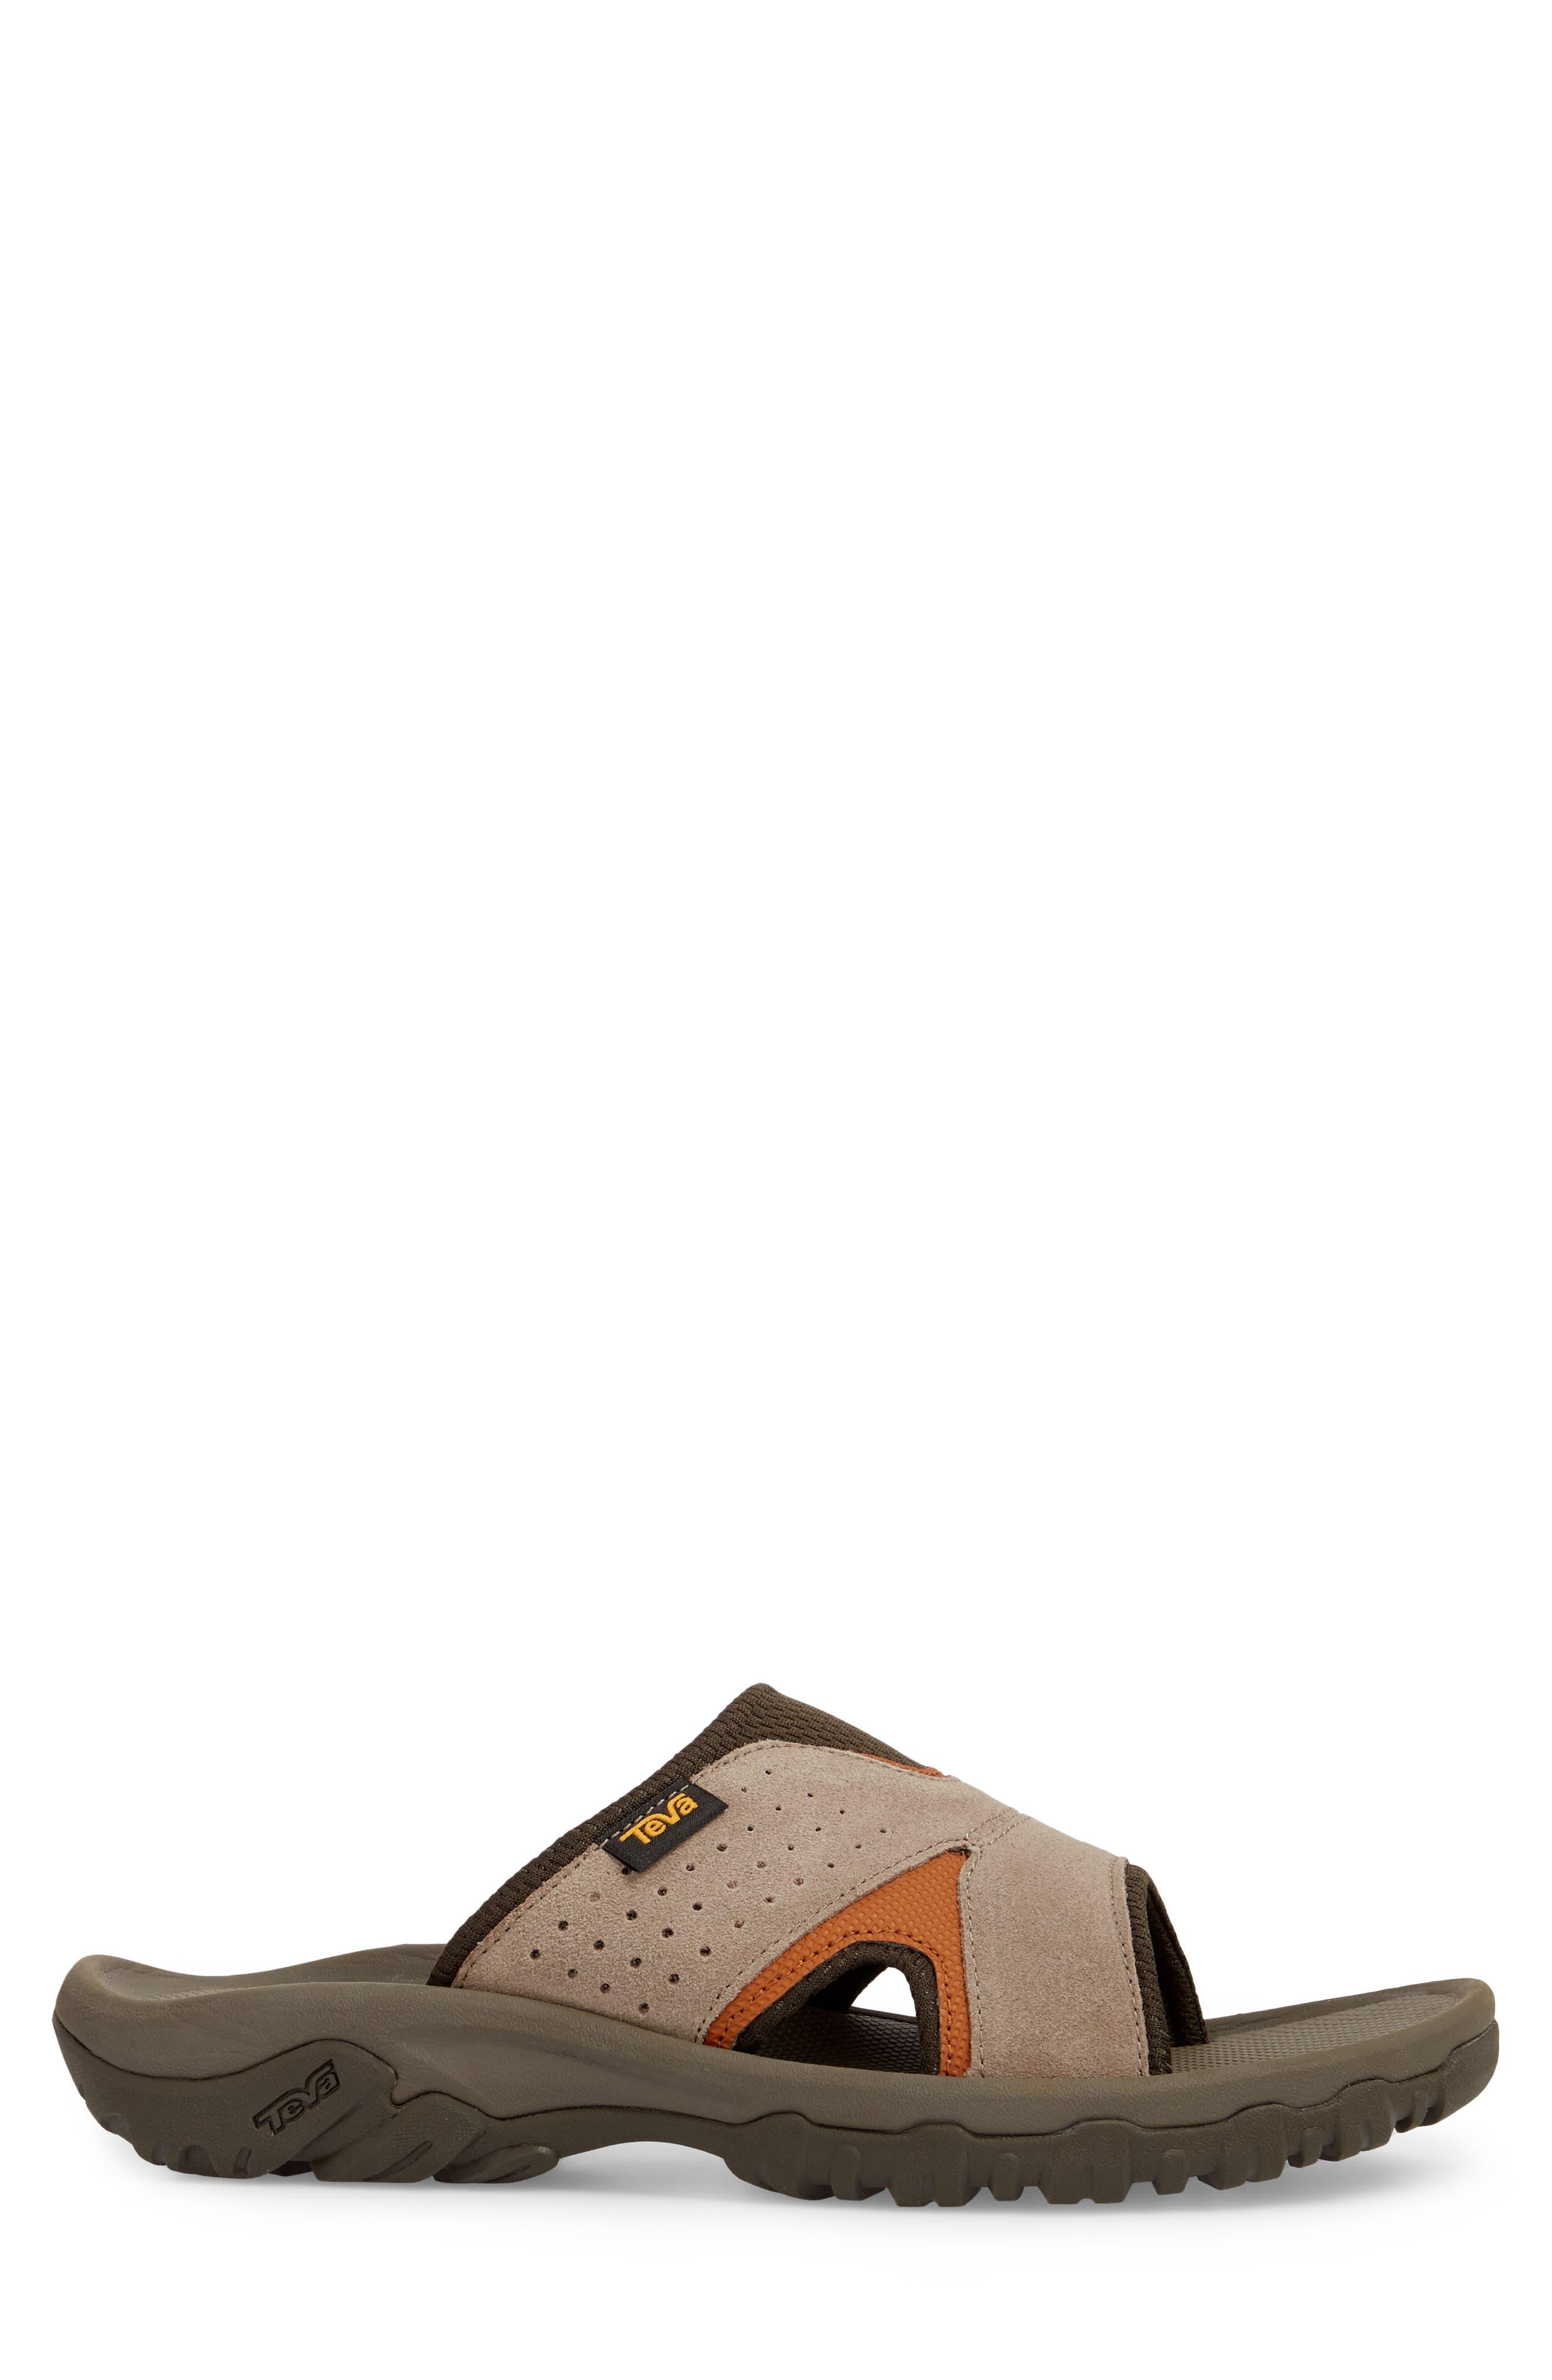 Katavi 2 Slide Sandal,                             Alternate thumbnail 3, color,                             Walnut Suede